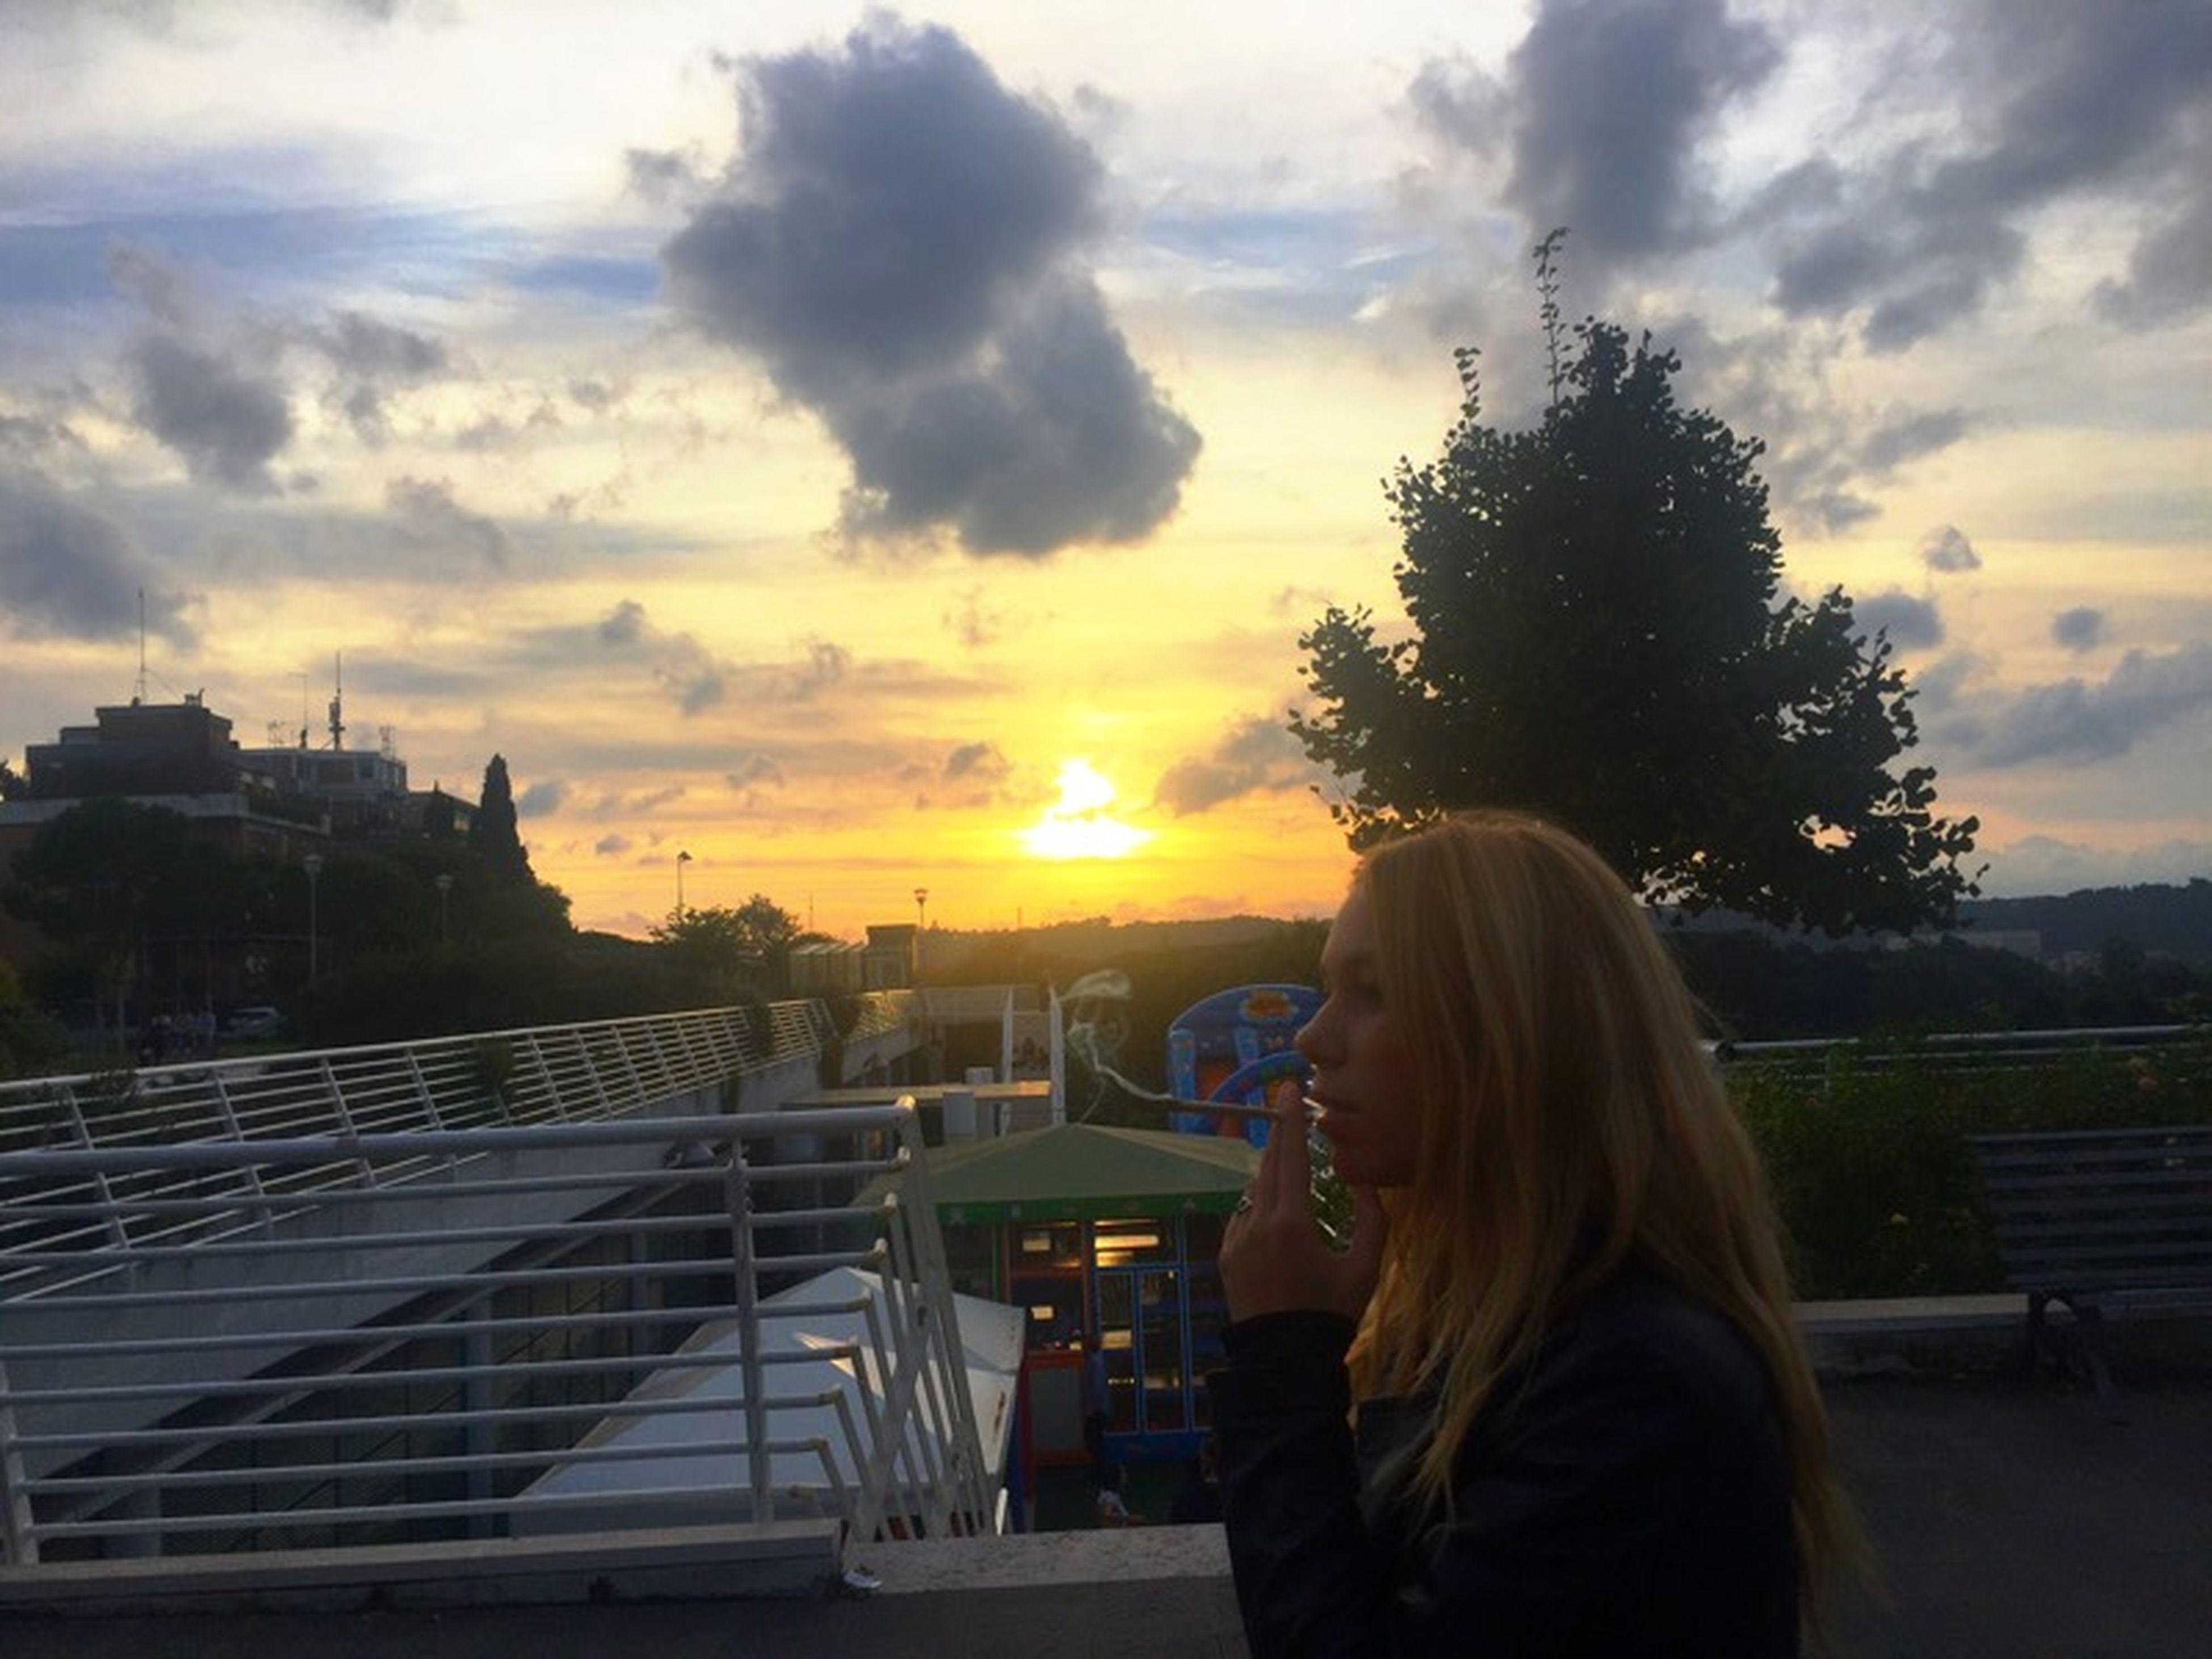 sunset, sky, lifestyles, leisure activity, rear view, cloud - sky, person, waist up, sitting, orange color, building exterior, casual clothing, cloud, sun, transportation, long hair, built structure, standing